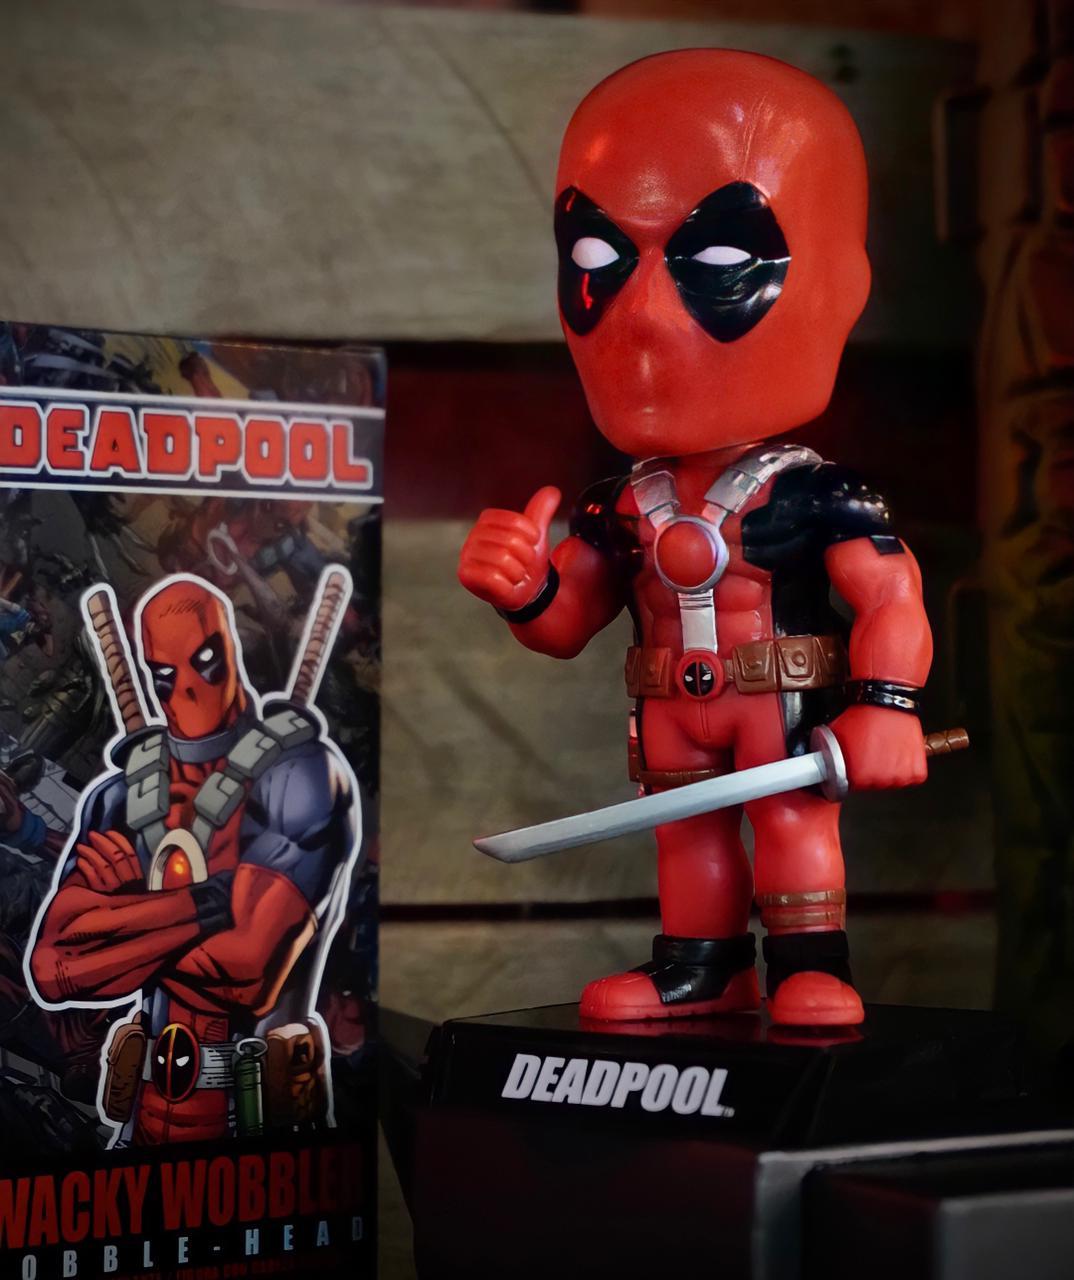 Estátua Wacky Wobbler Deadpool: Marvel Comics Bubble-Head - Funko